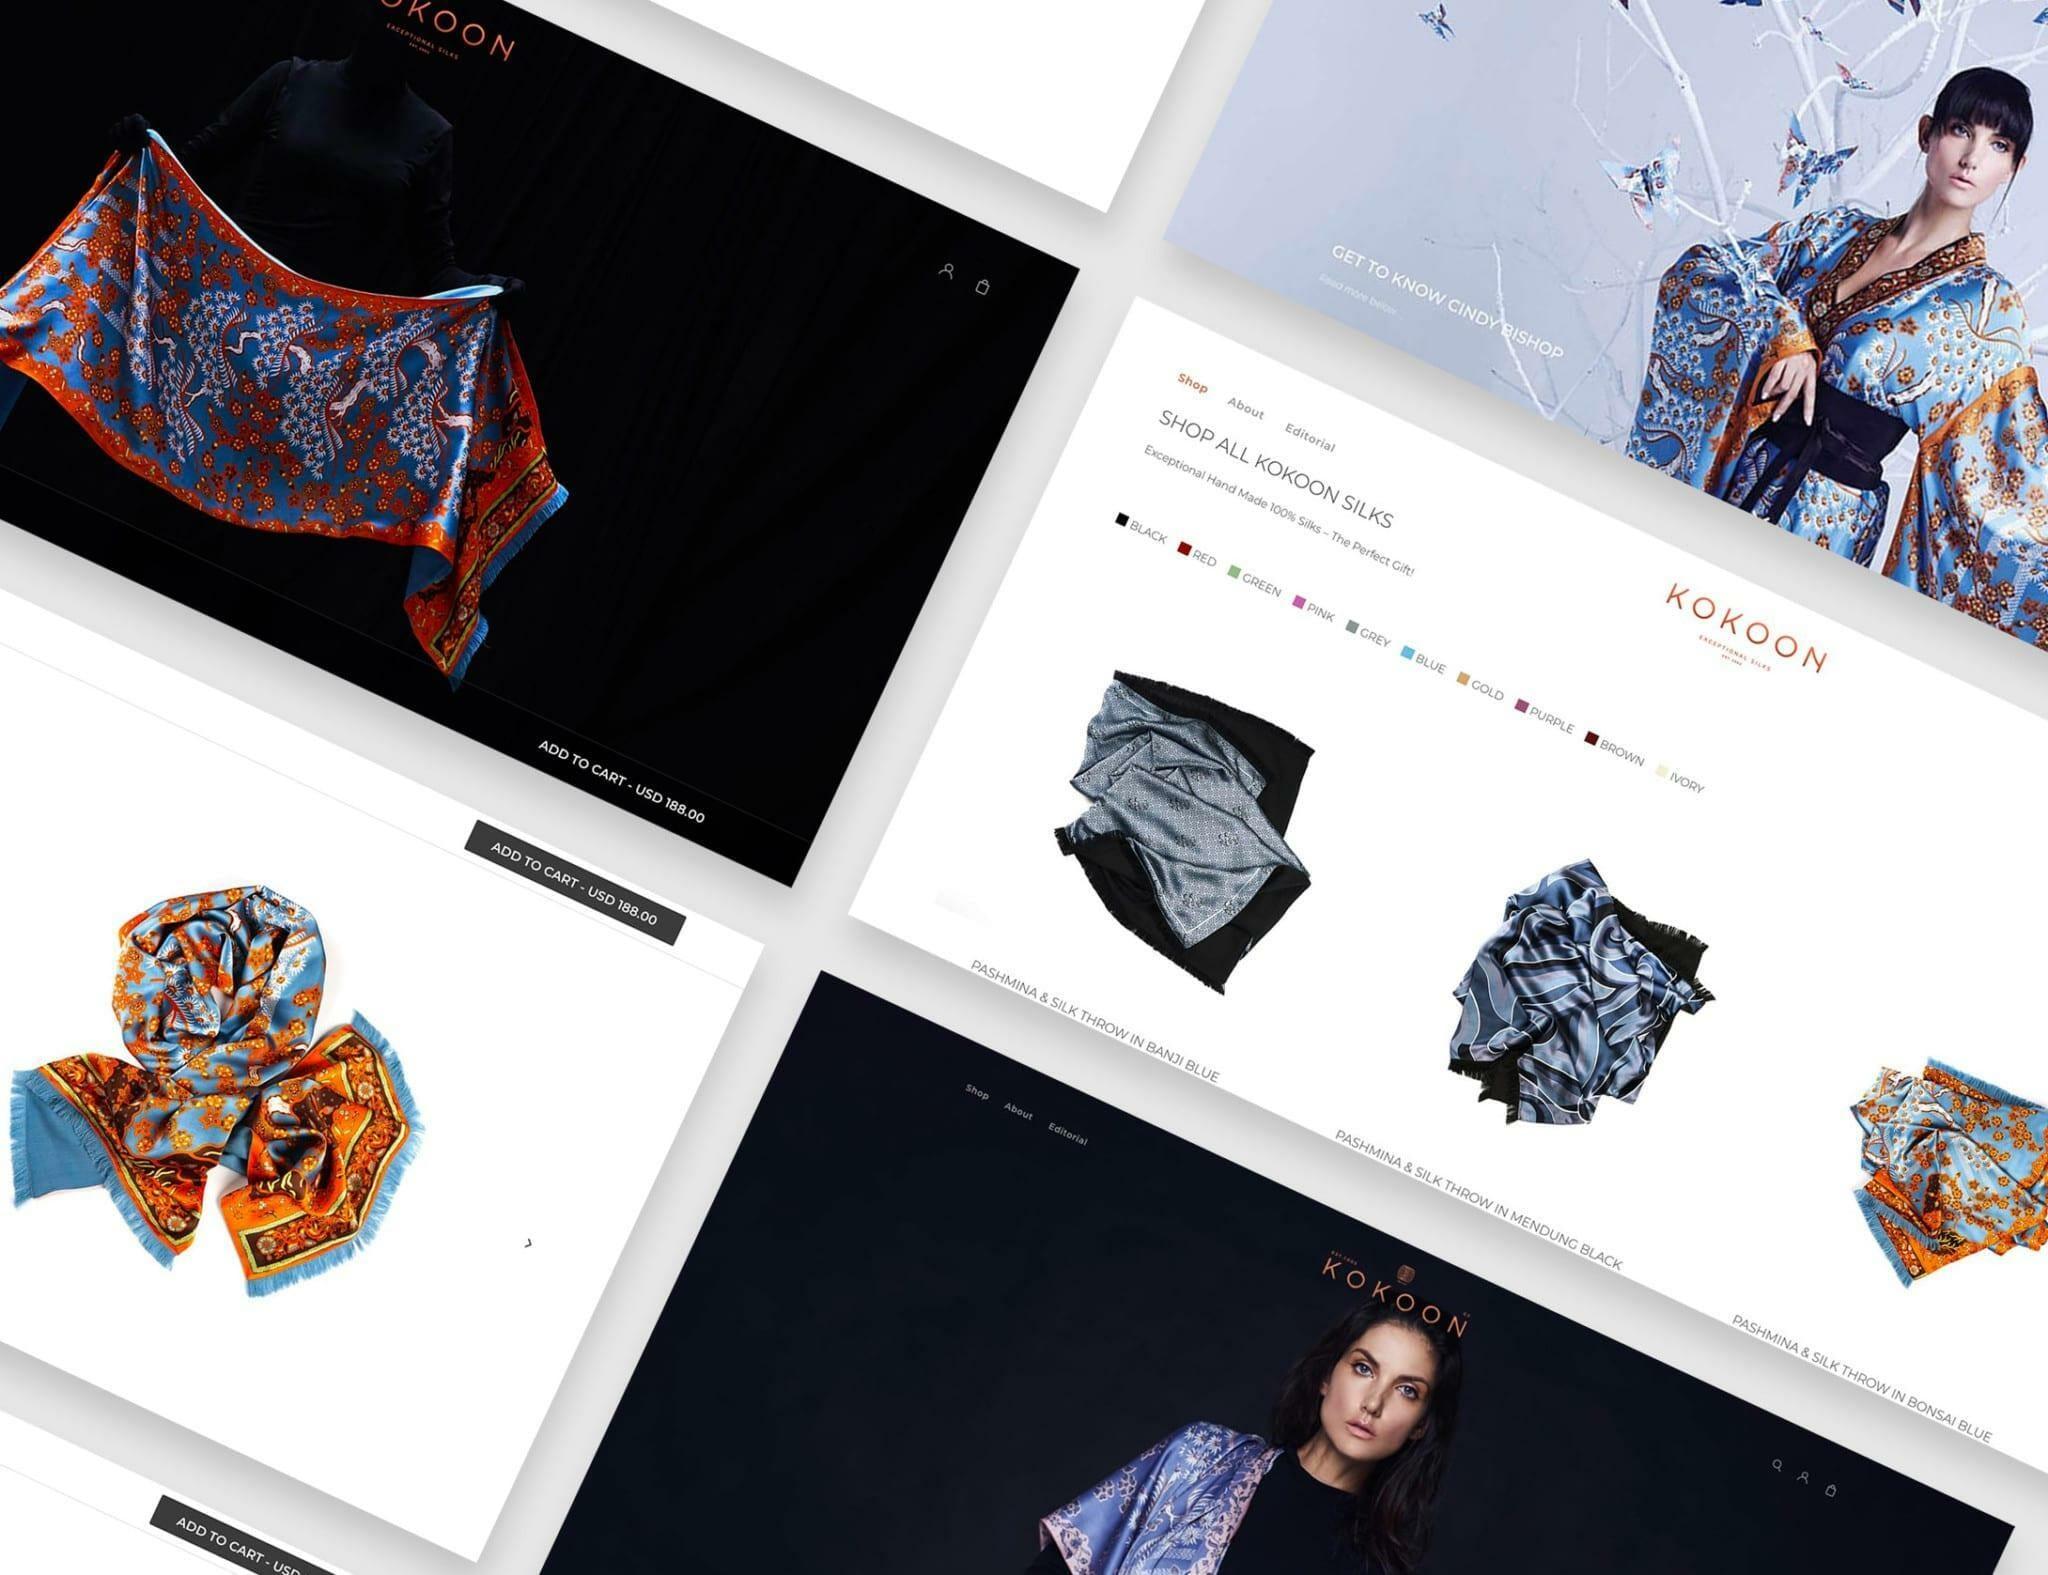 kokoon-silks-ecommerce-services-website-dazze